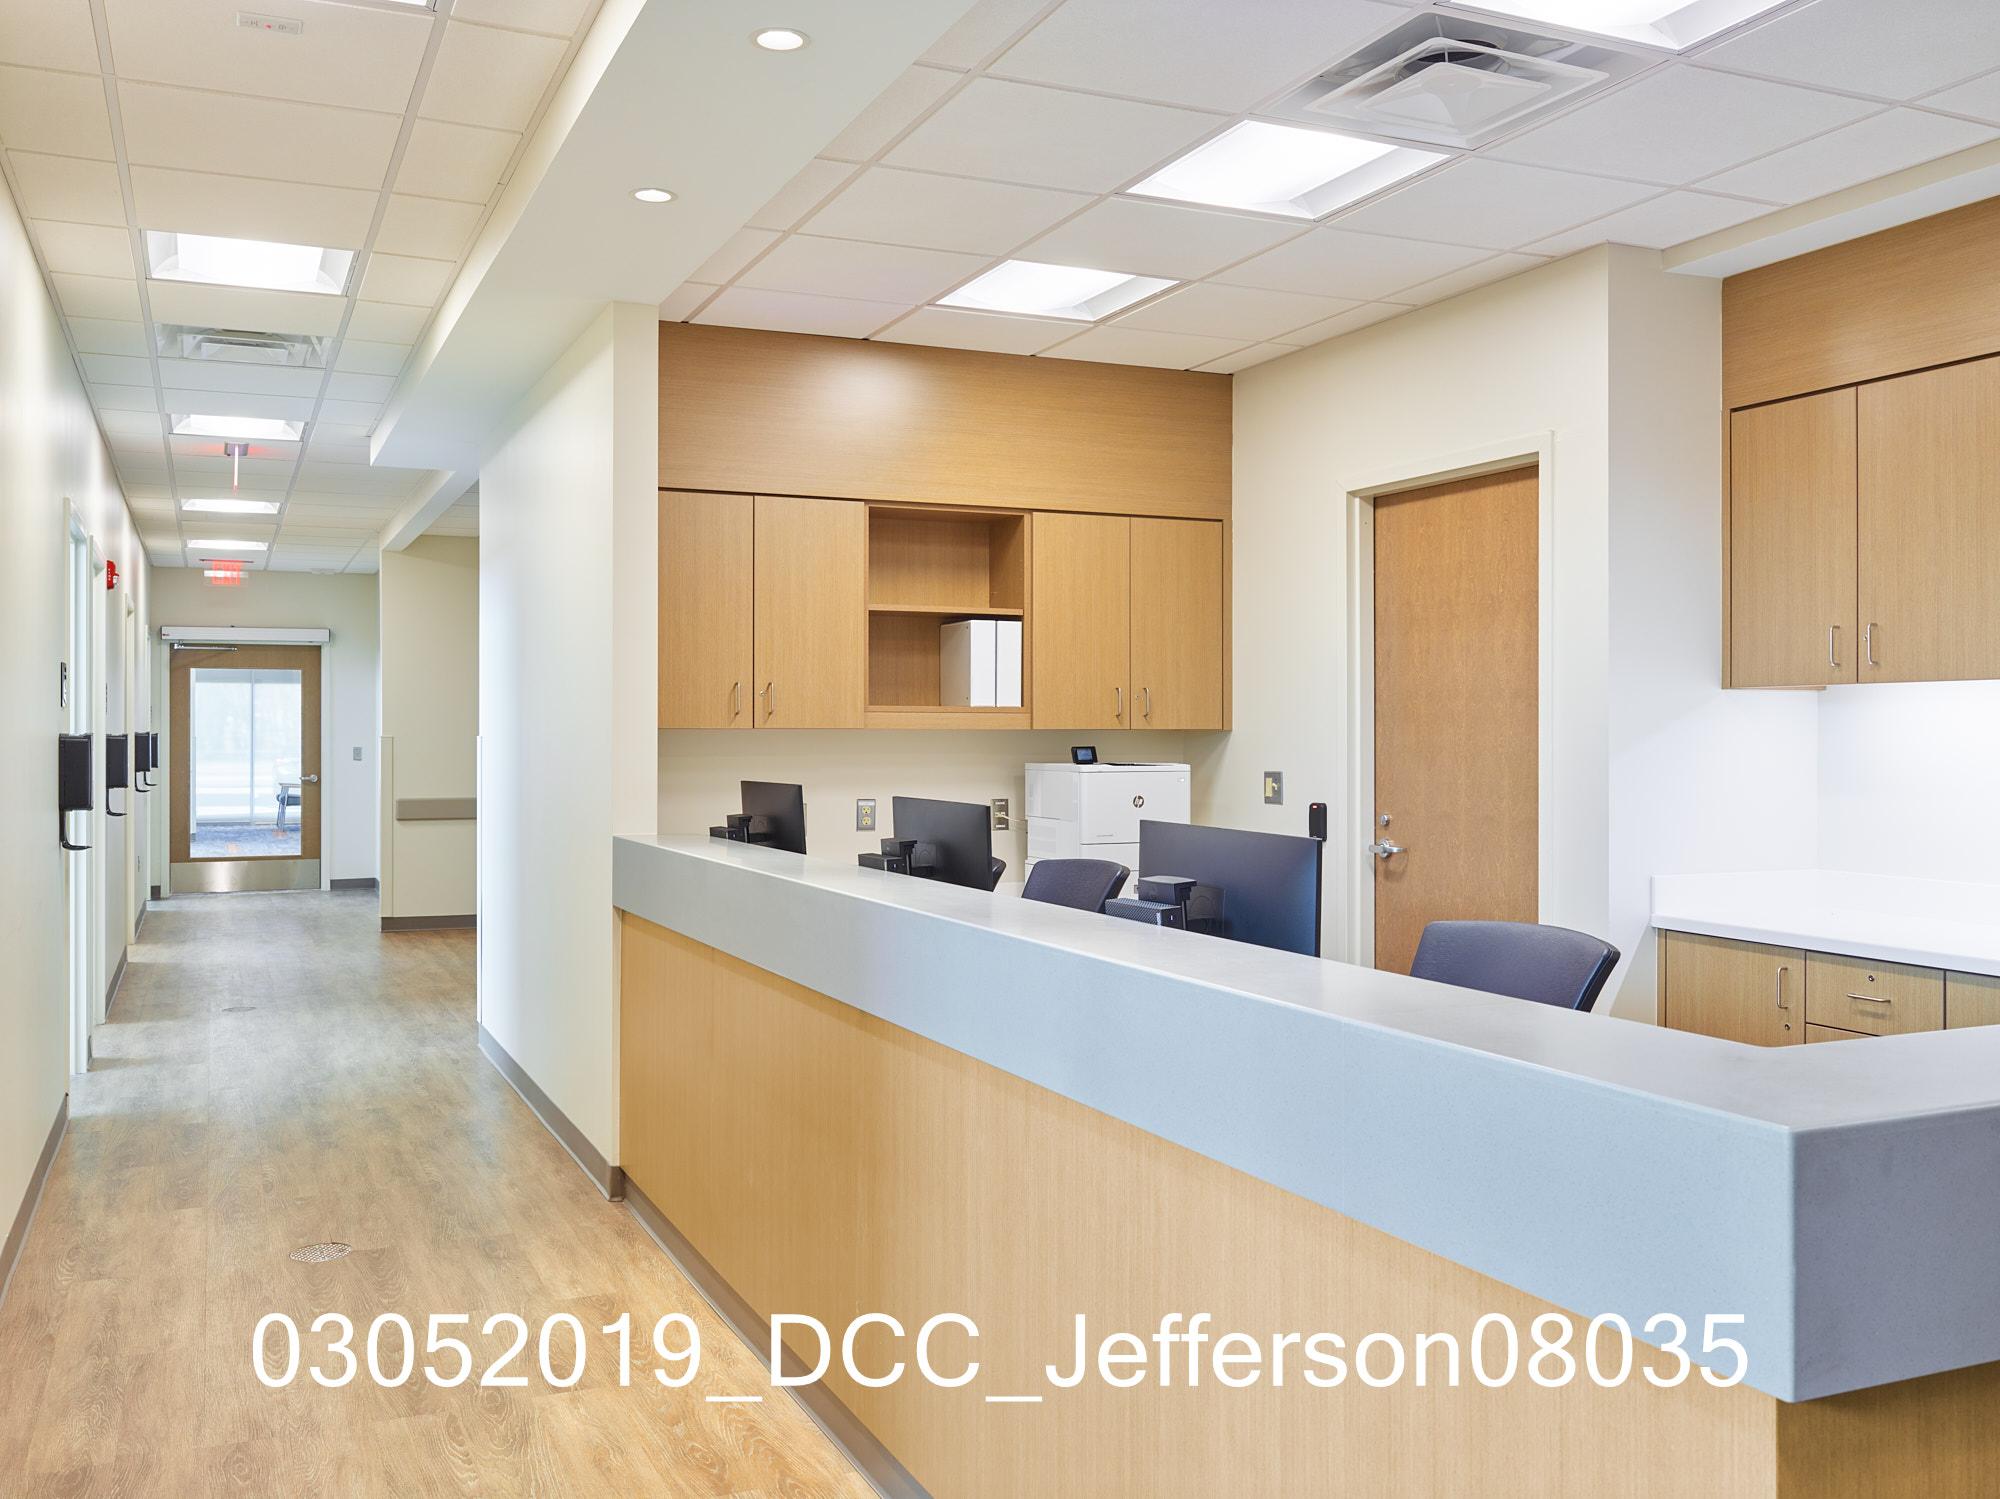 03052019_DCC_Jefferson08035.jpg